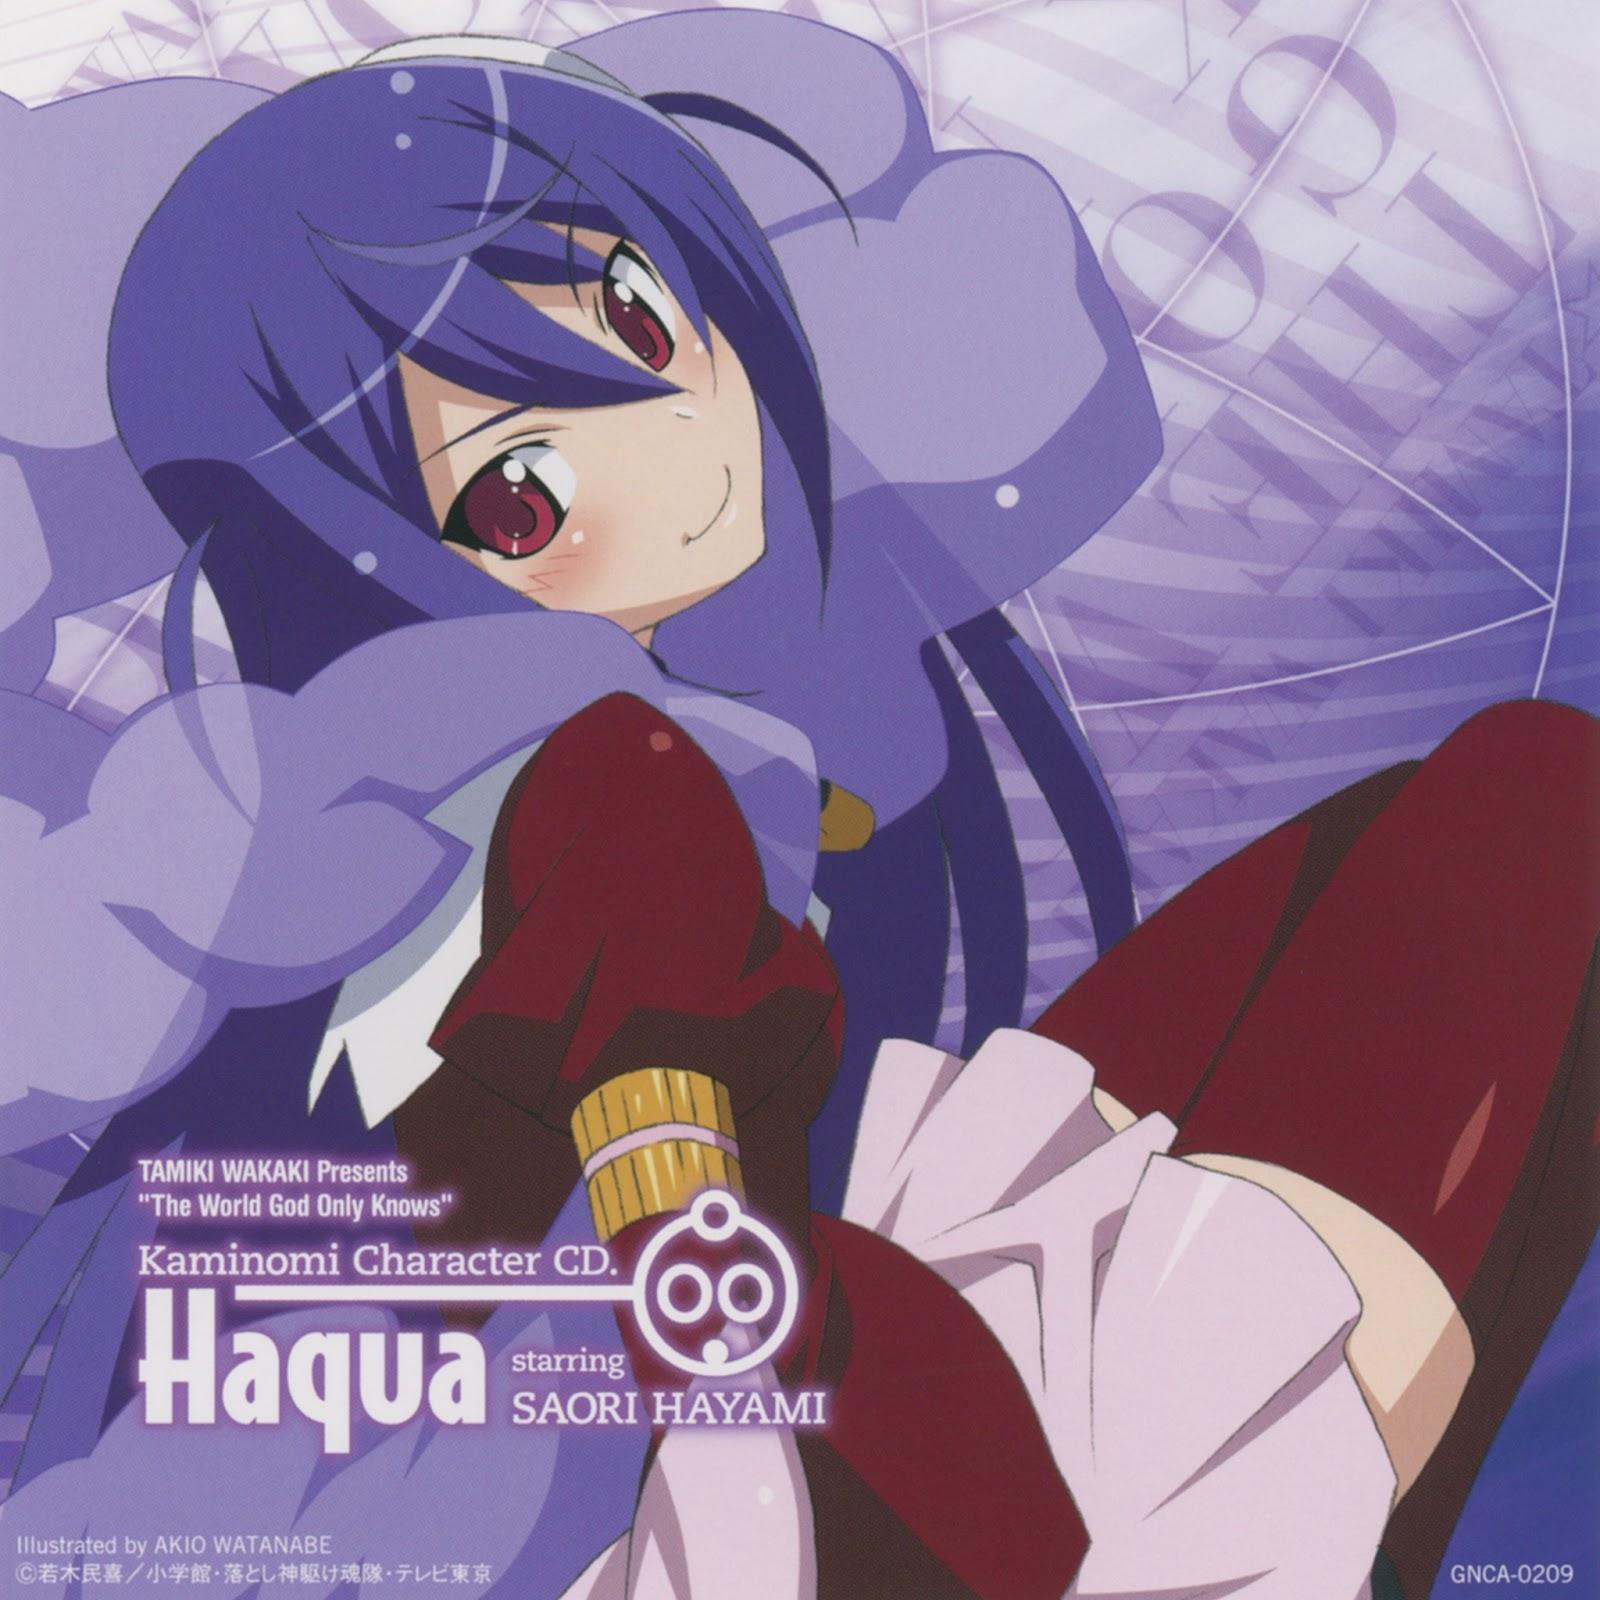 Kami Nomi zo Shiru Sekai II Character CD 00 - Haqua